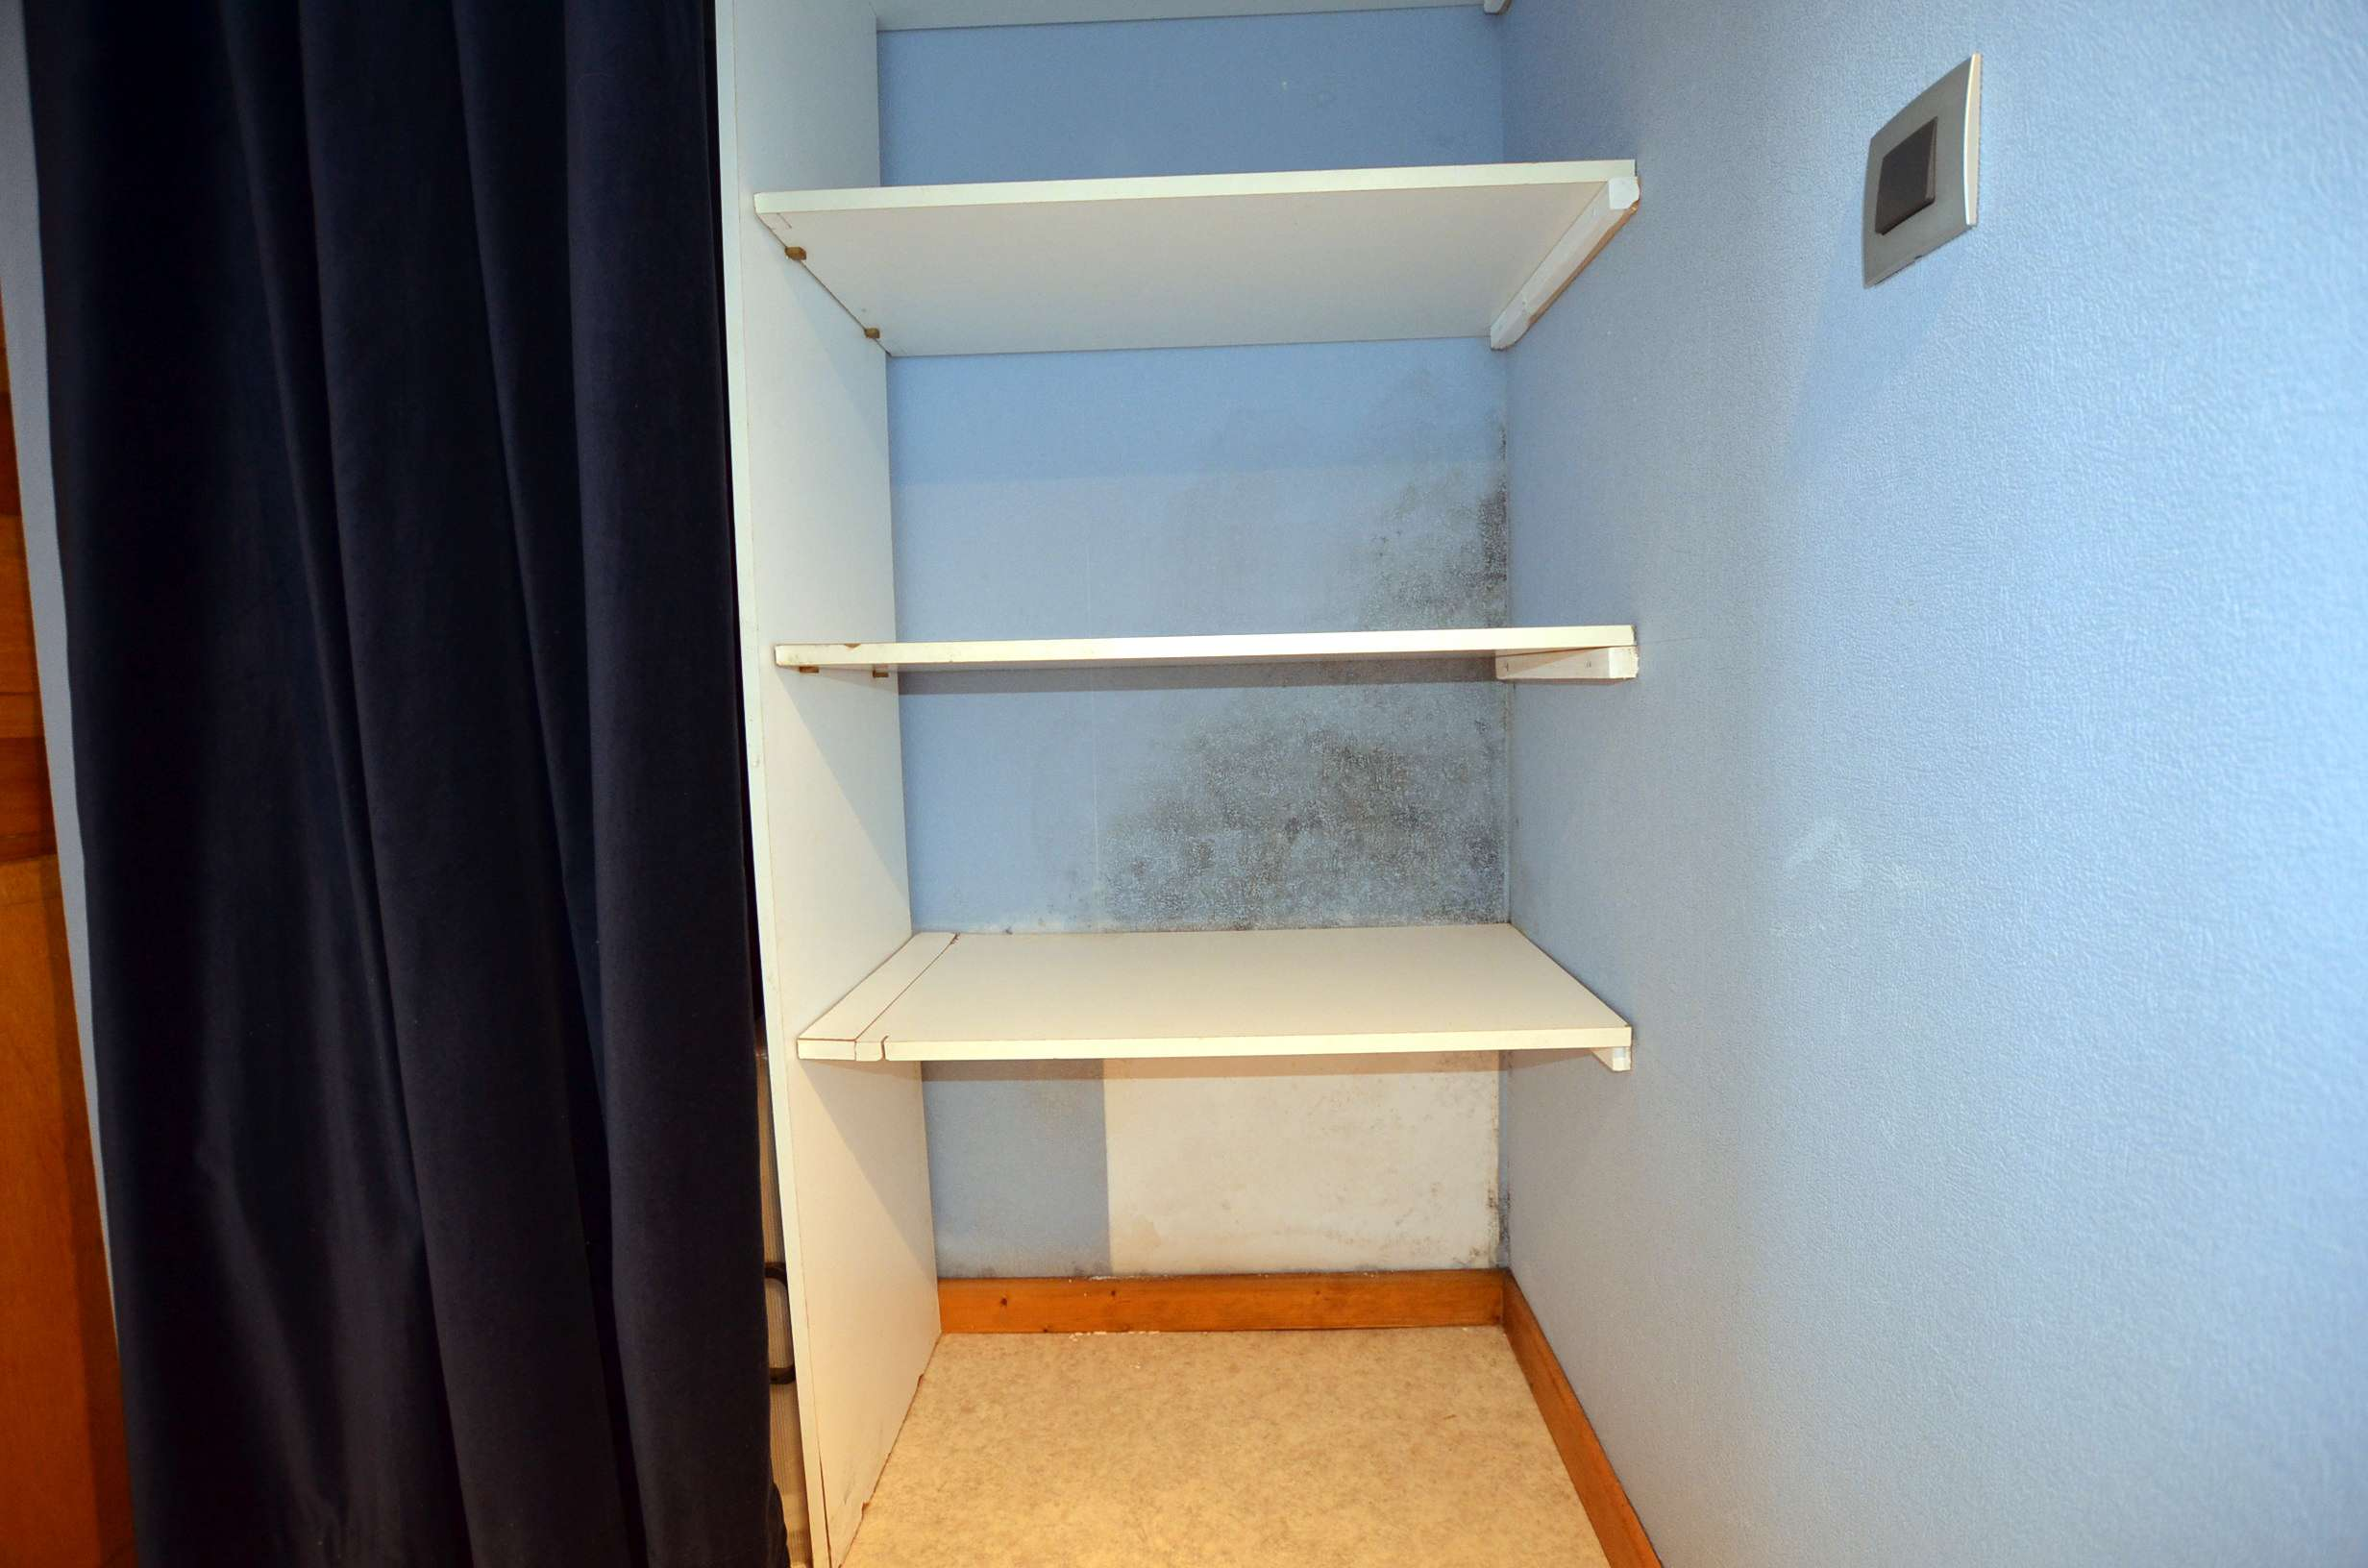 sourcier remont es capillaires des murs humides. Black Bedroom Furniture Sets. Home Design Ideas